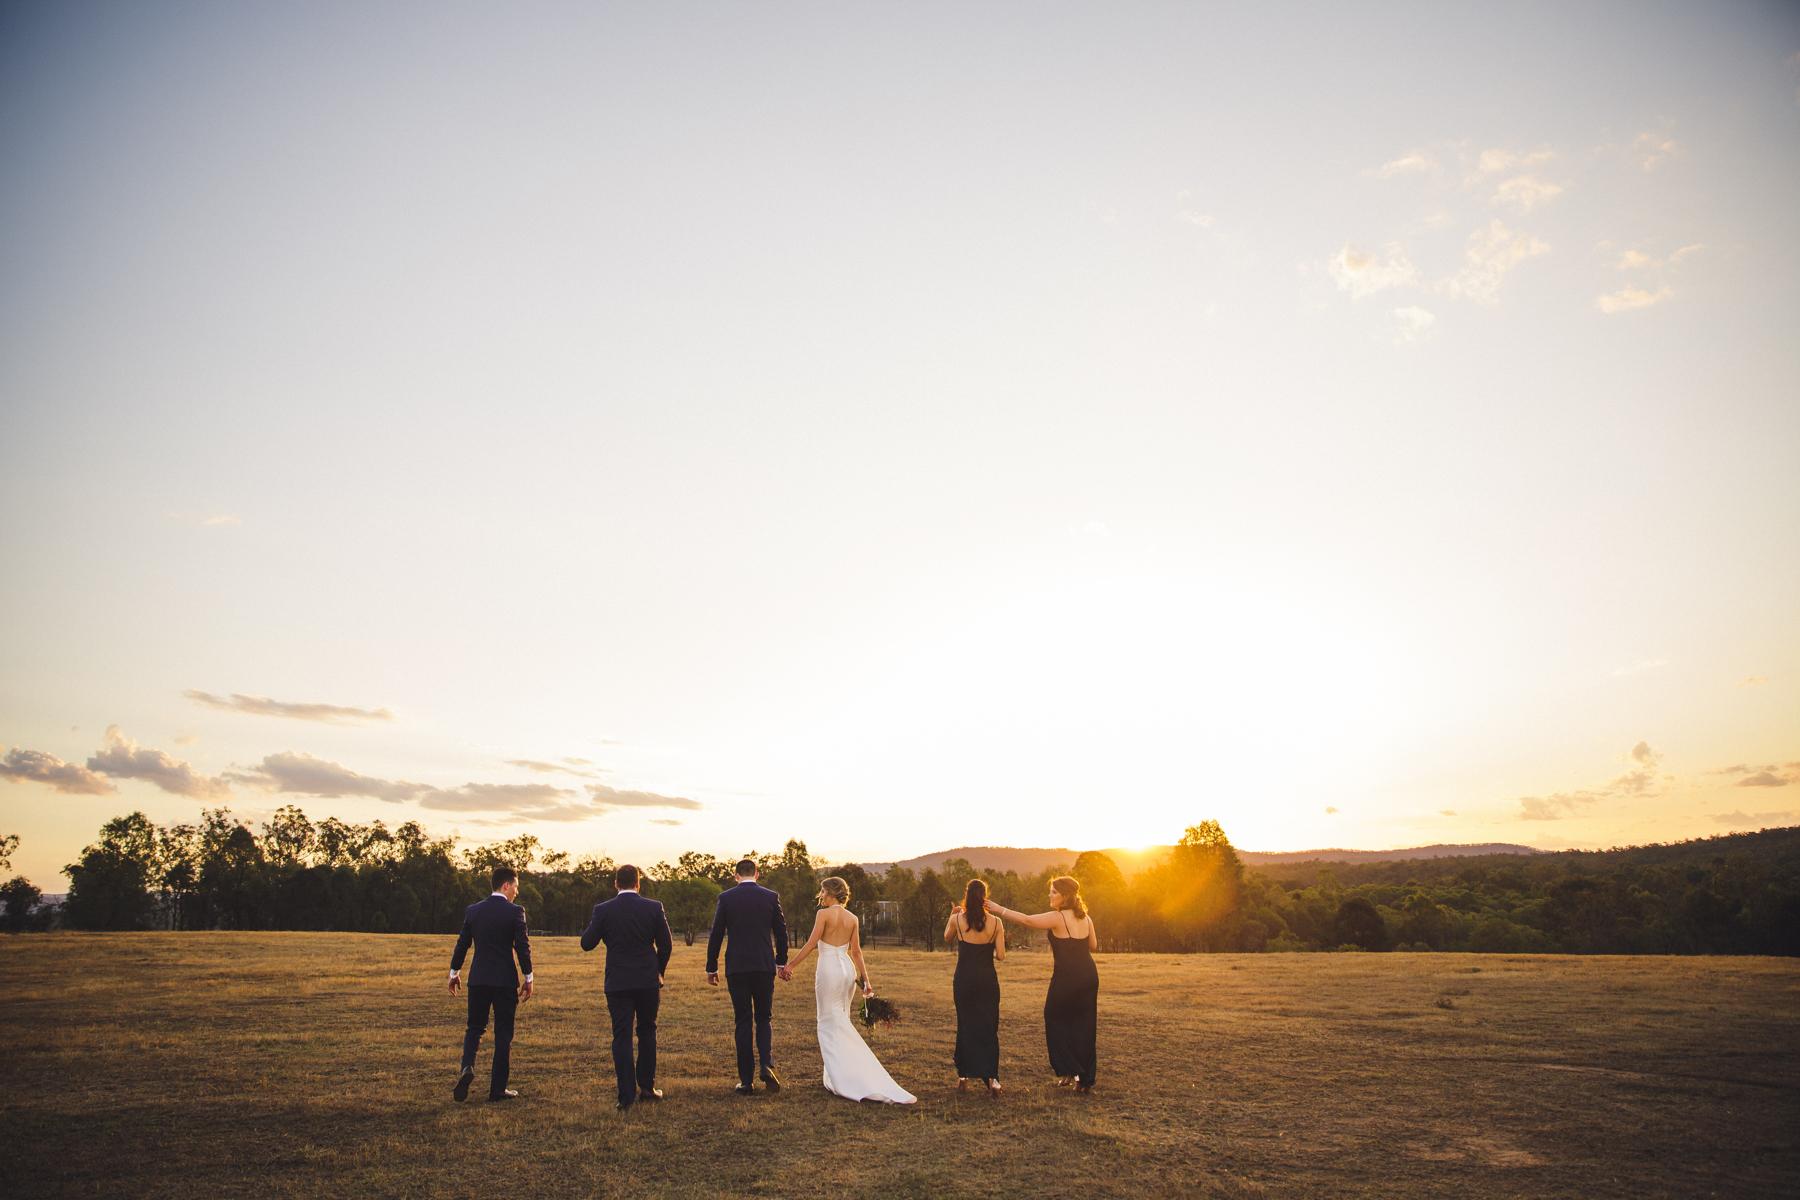 spicers-hiddenvale-wedding-104A.JPG